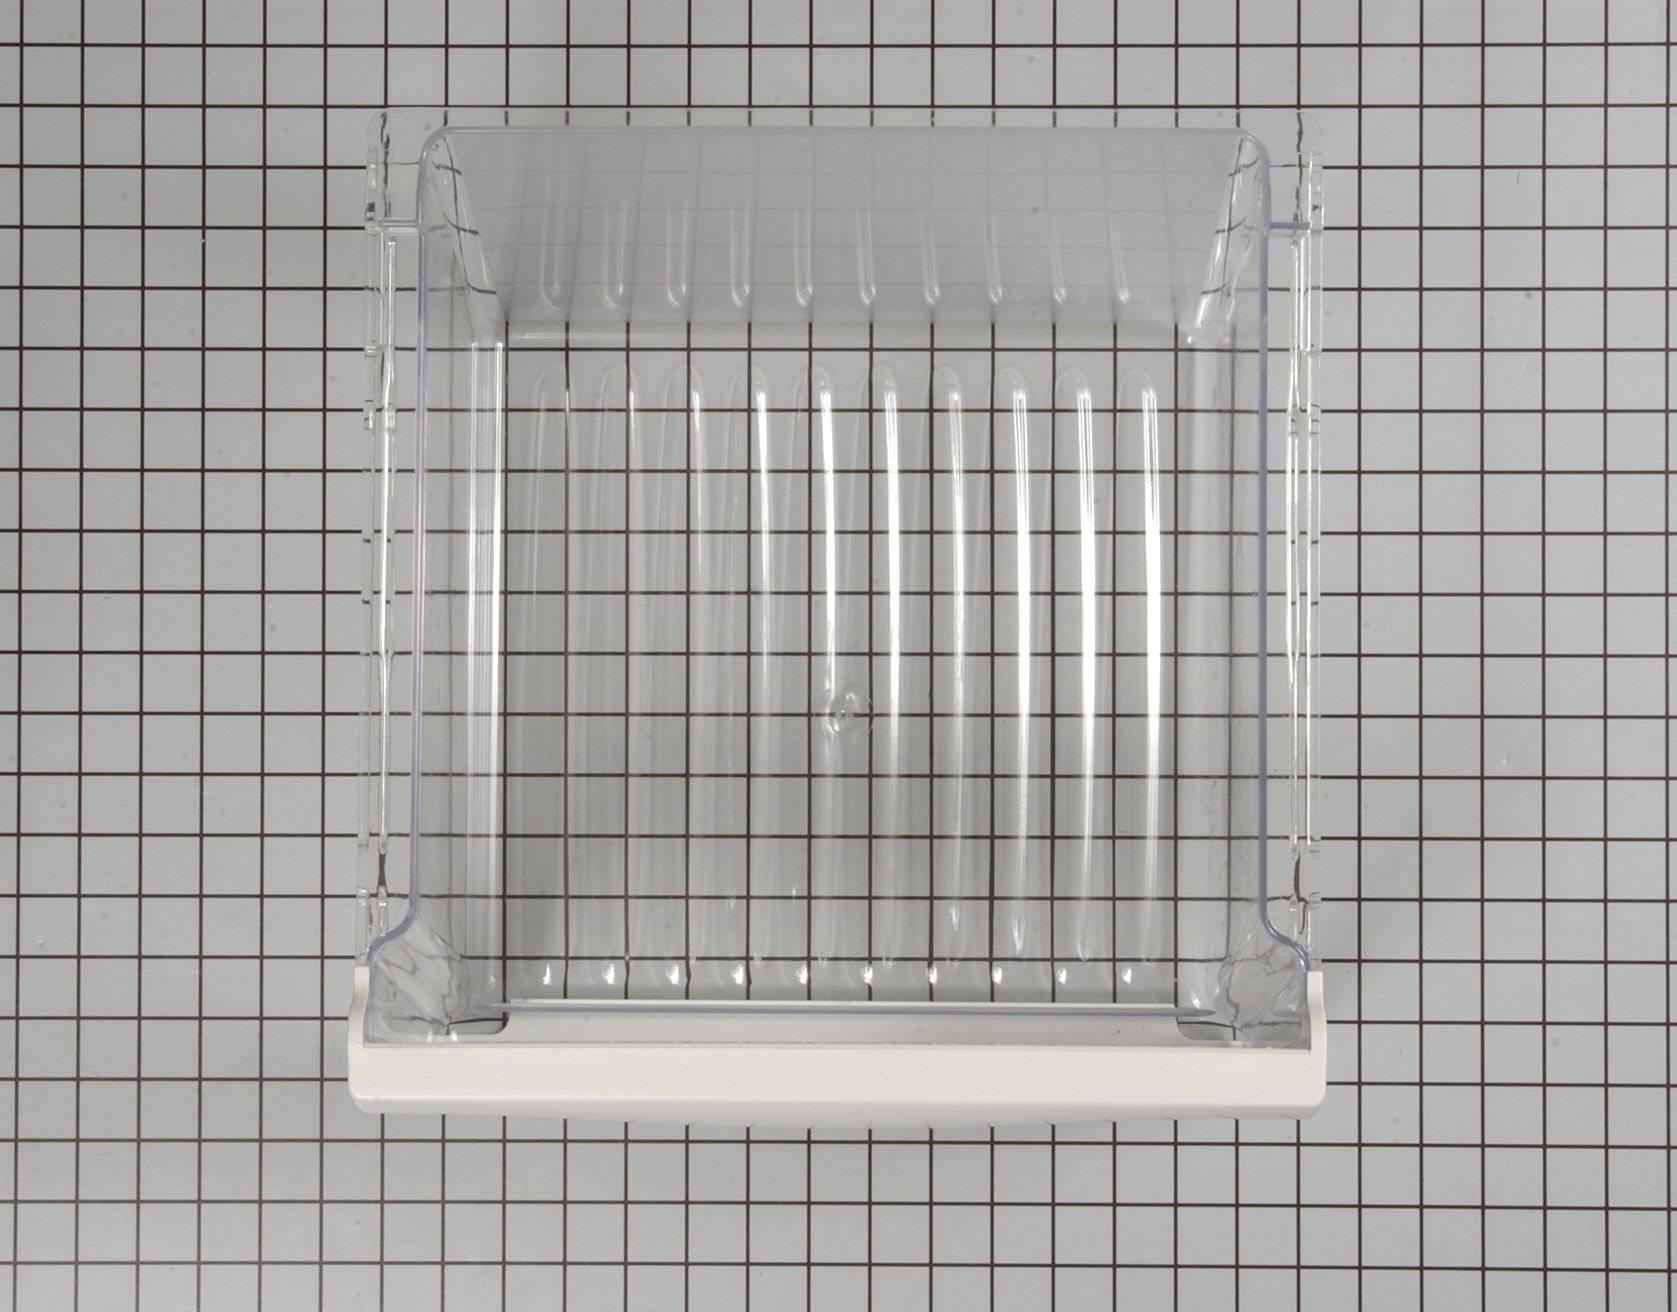 WP67005906 Kenmore Refrigerator Part -Drawer